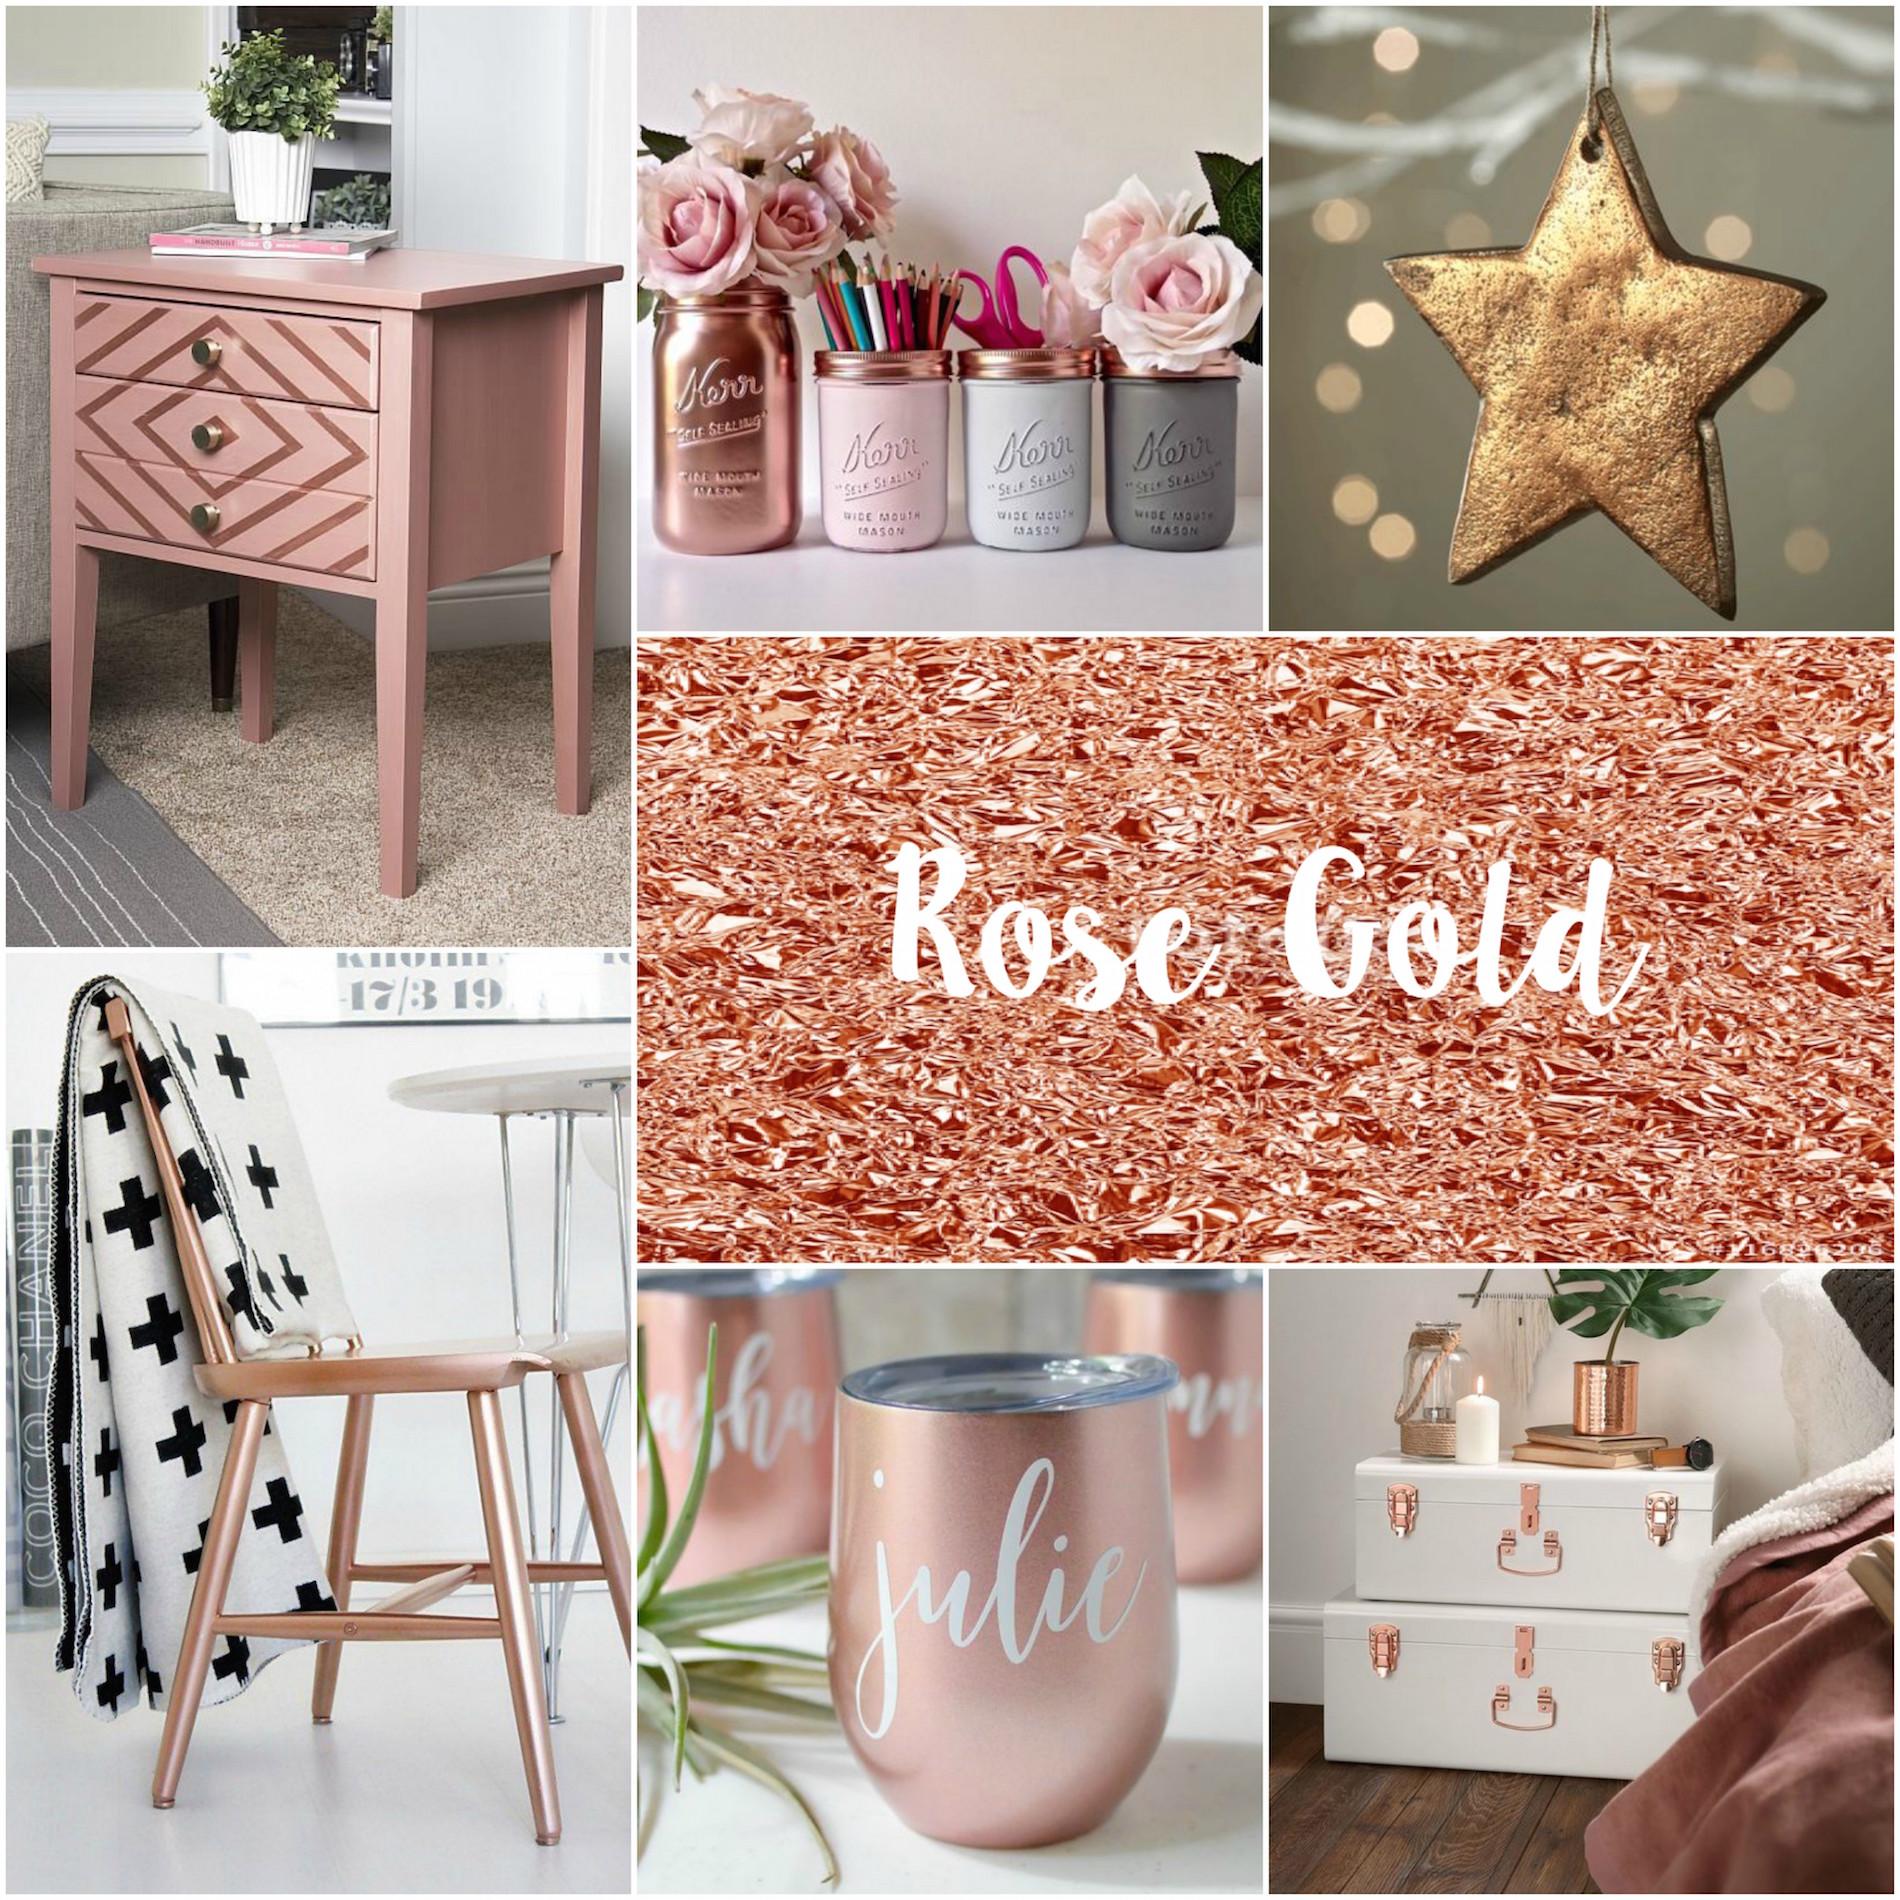 Rose Gold Inspiration!